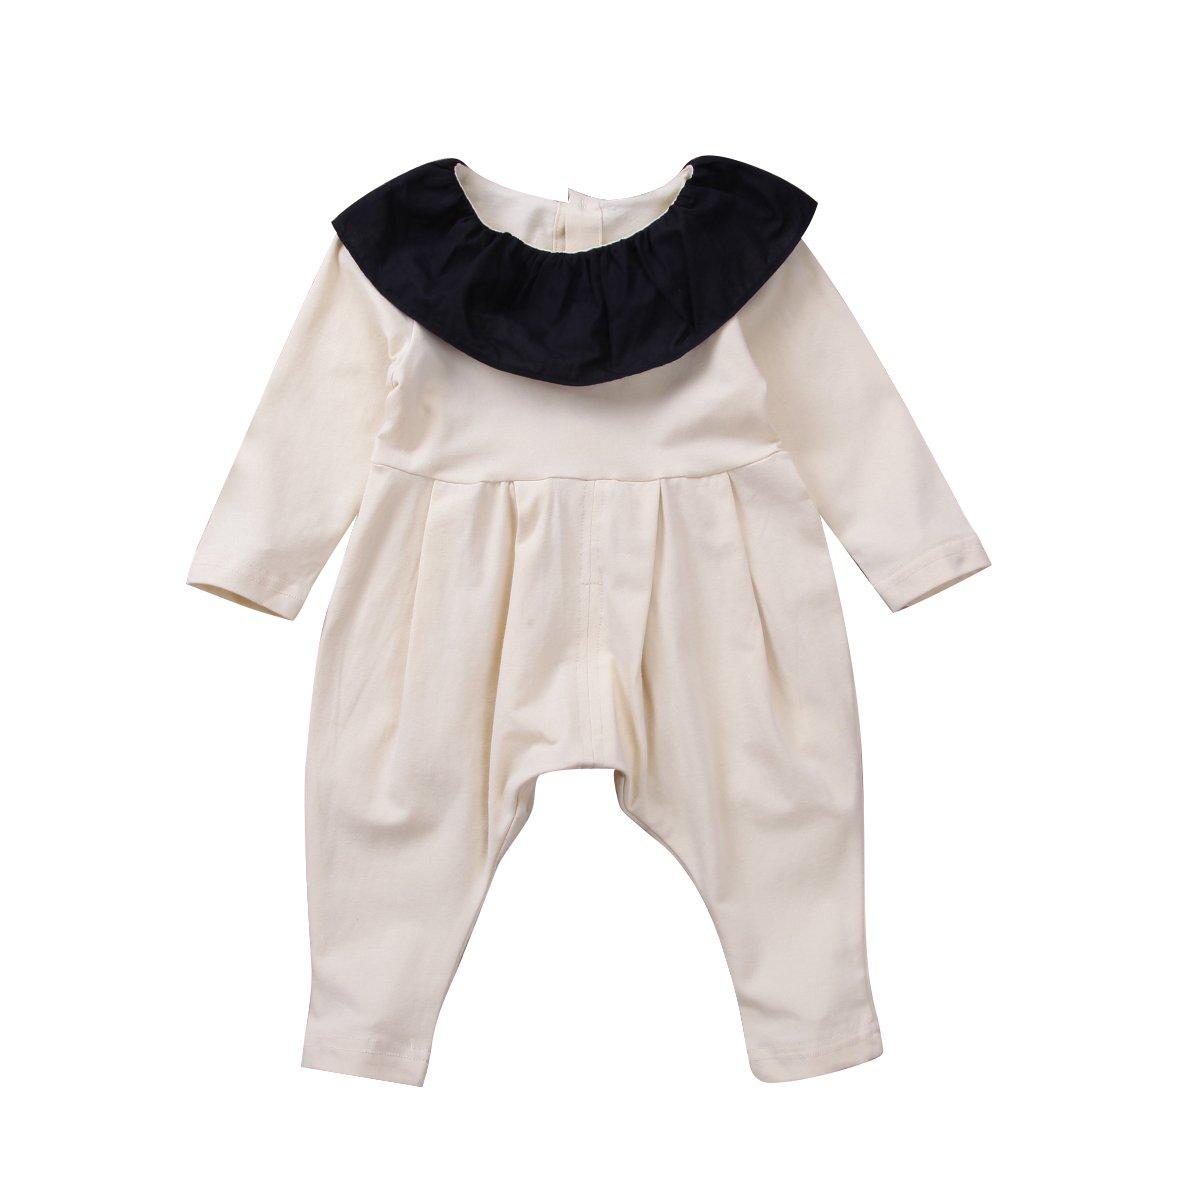 Infant Baby Girls Lovely Romper Lotus Leaf Collar Bodysuit Outfit Black Long Sleeve Basic Coveralls